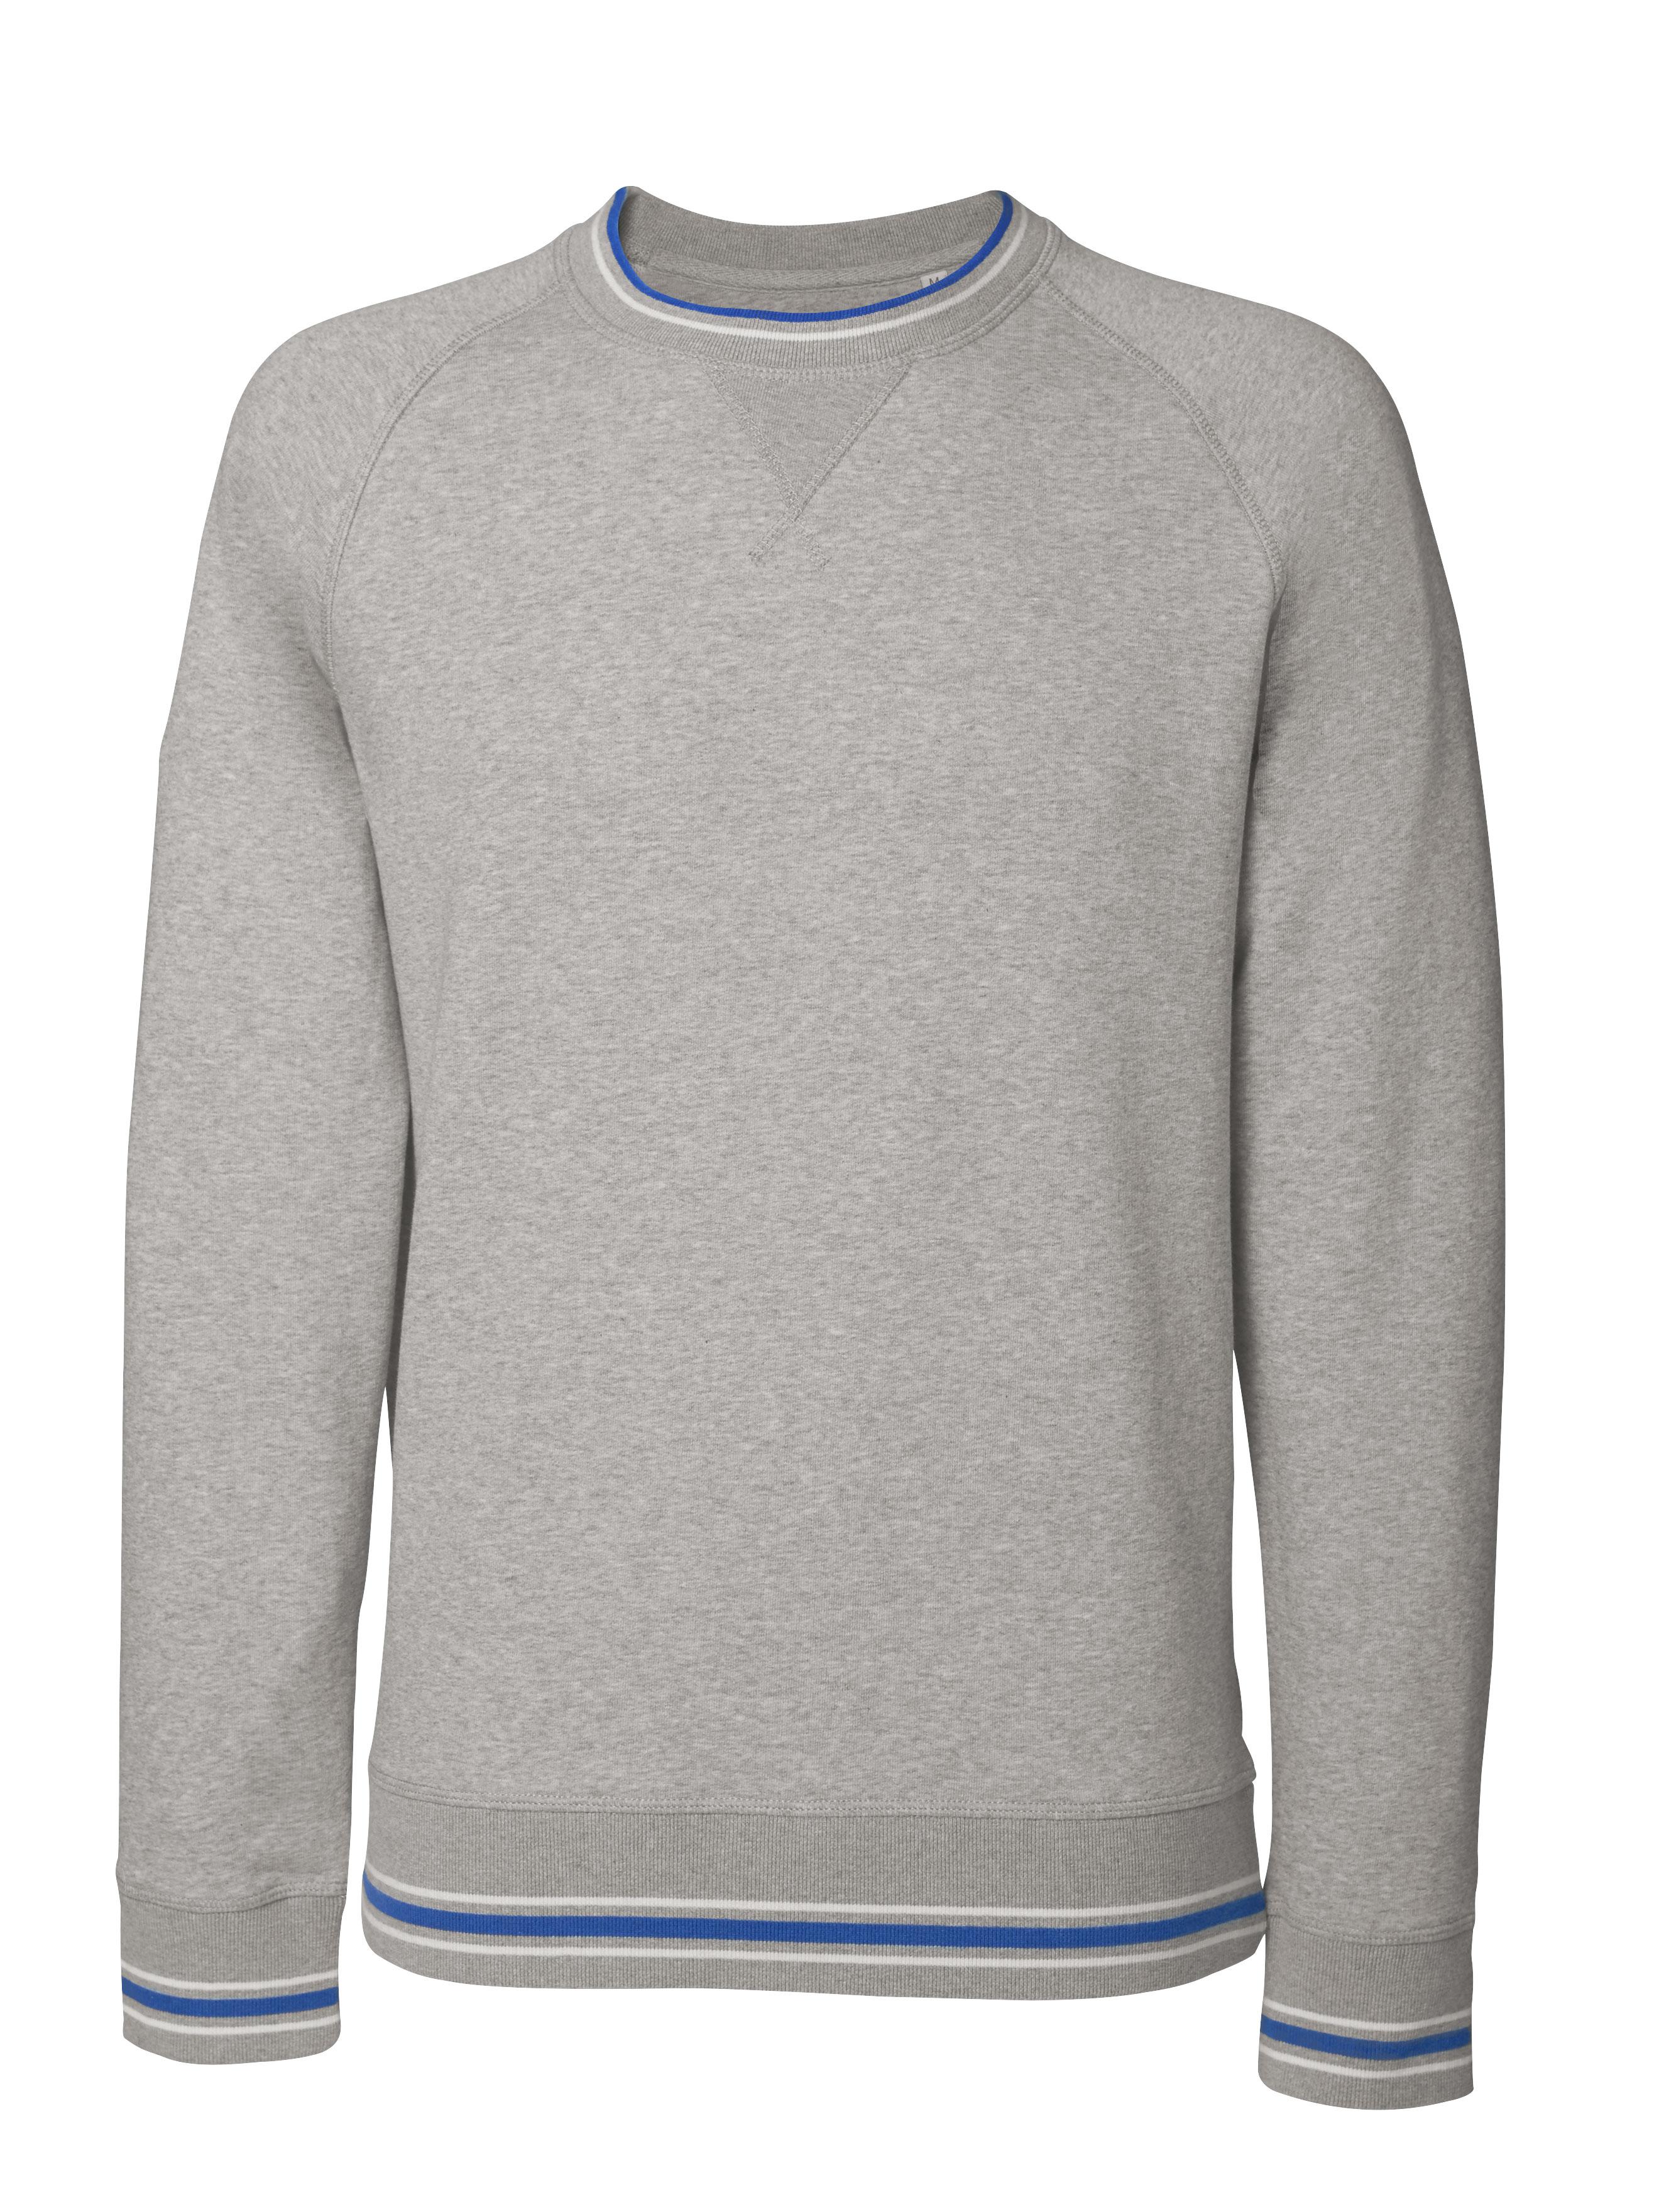 heather grey - white - deep royal blue